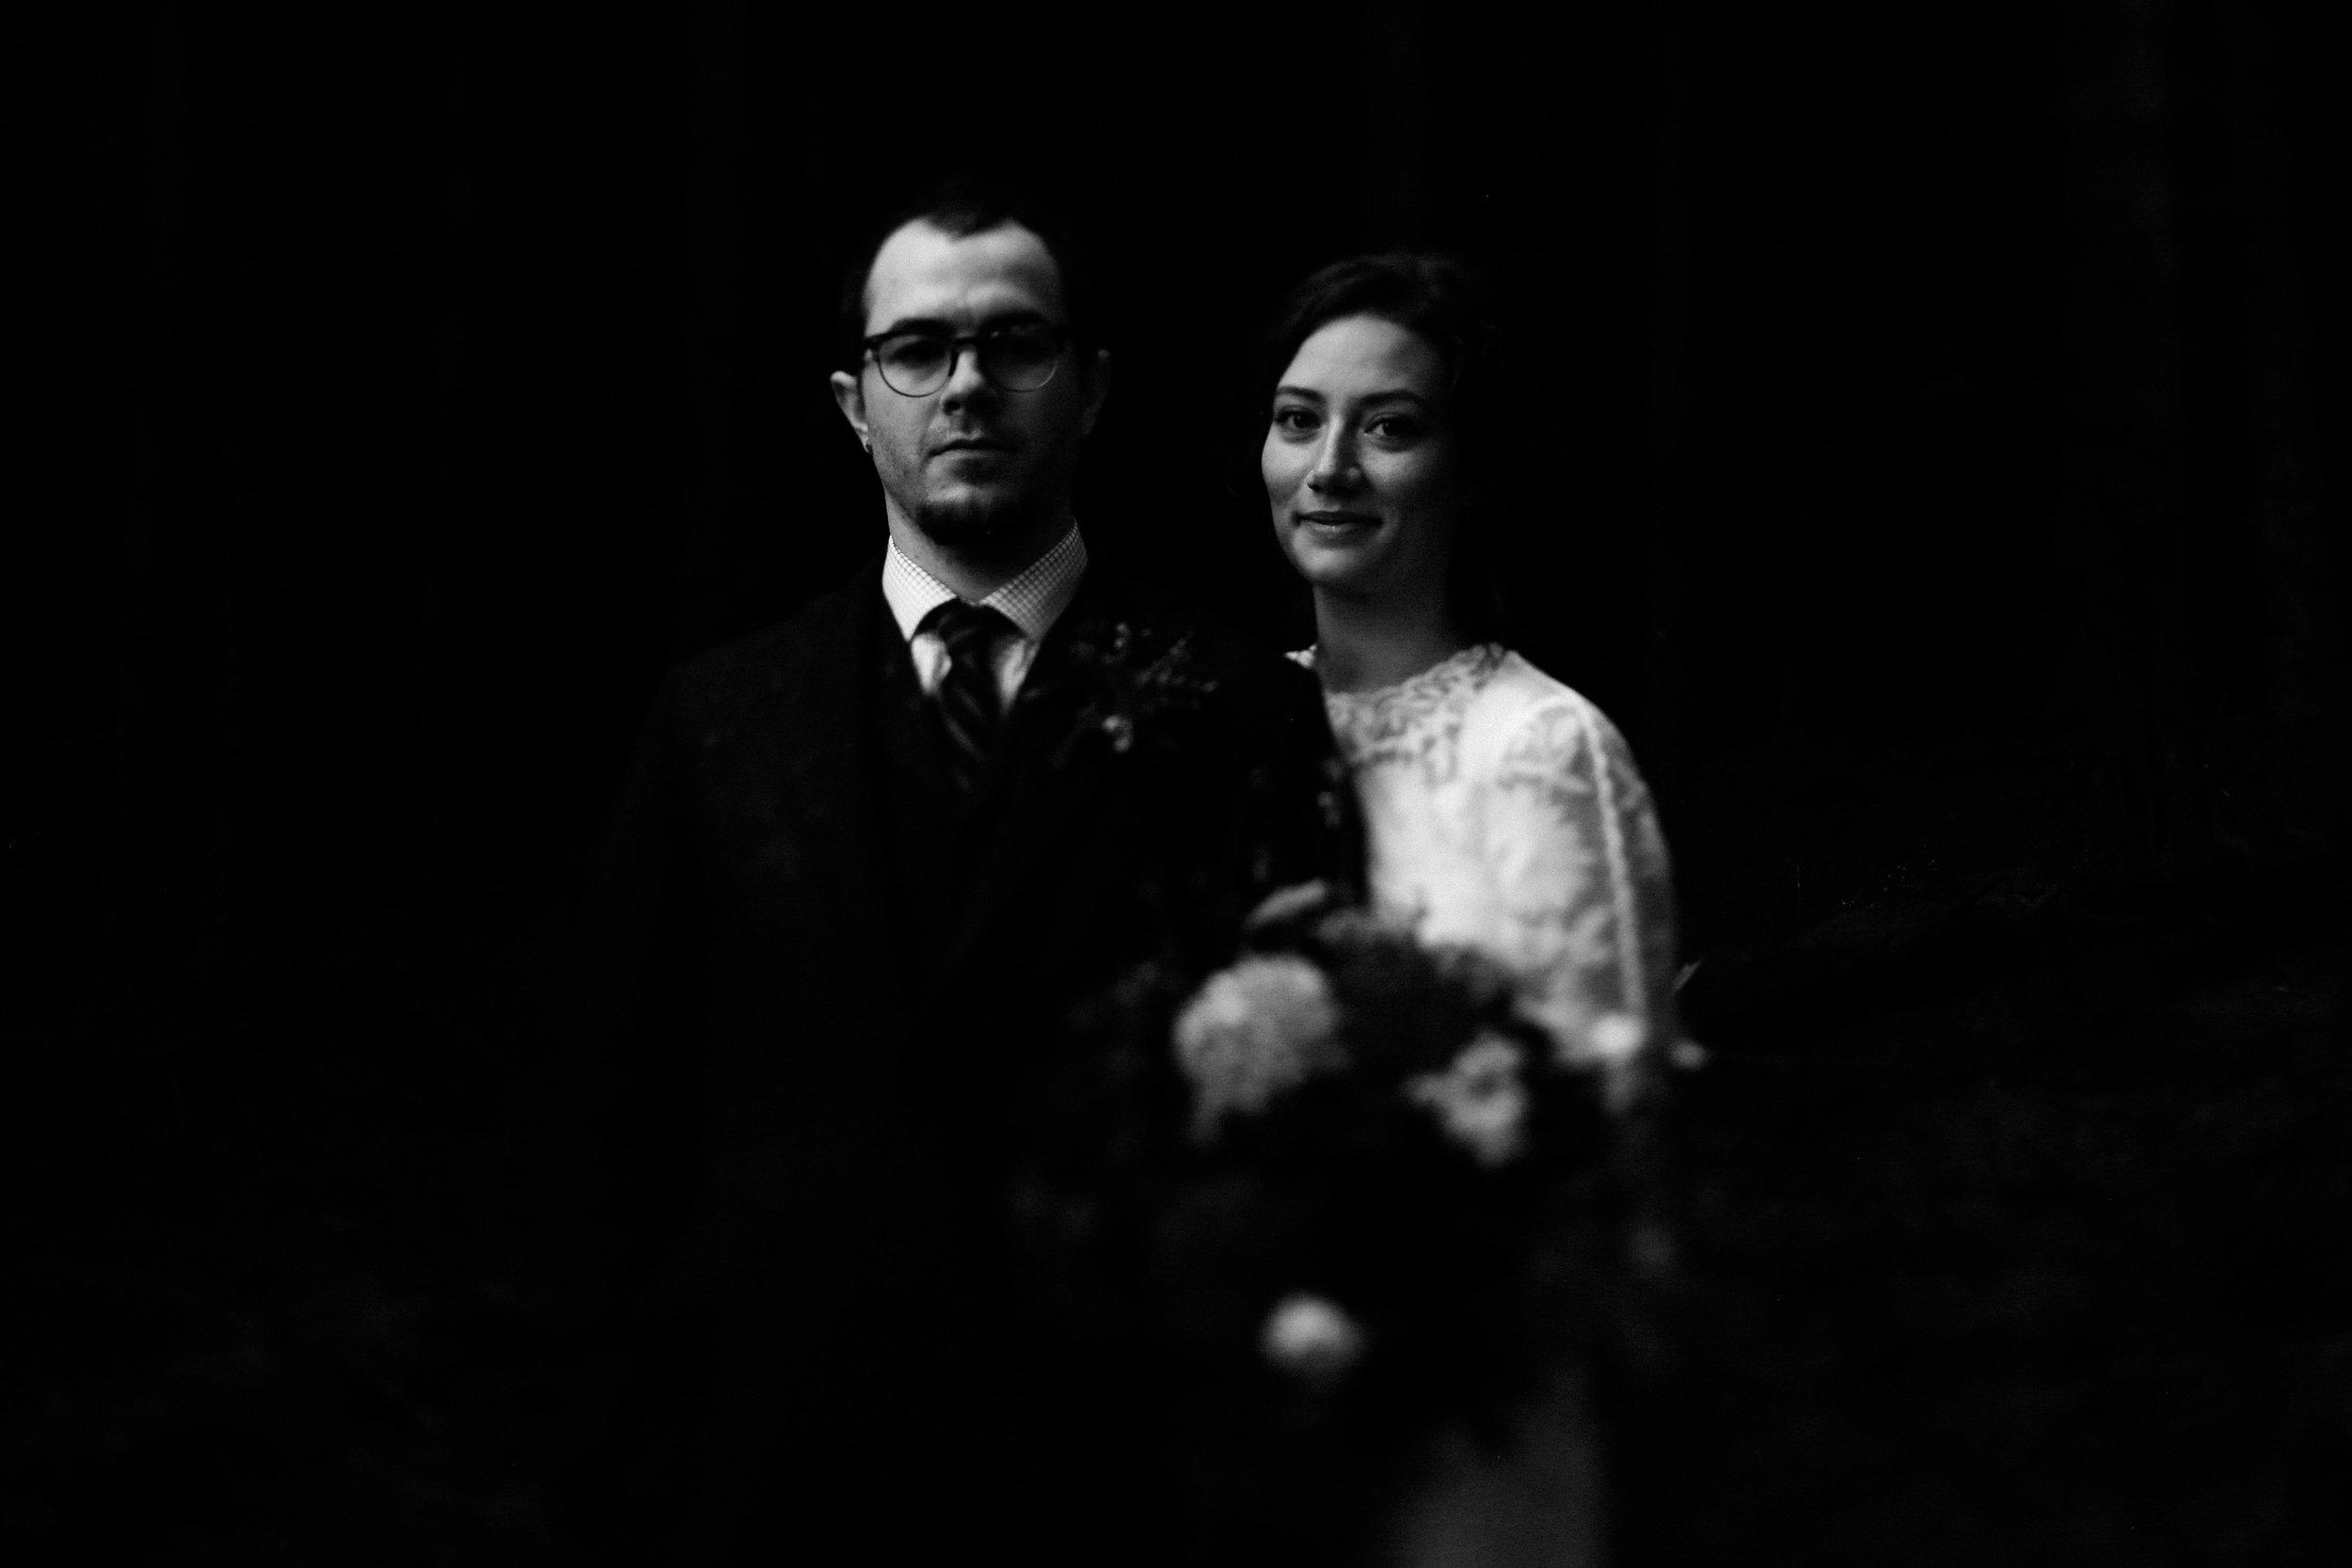 Scotland_Elopement_Melissa_Marshall_Photography_48.jpg